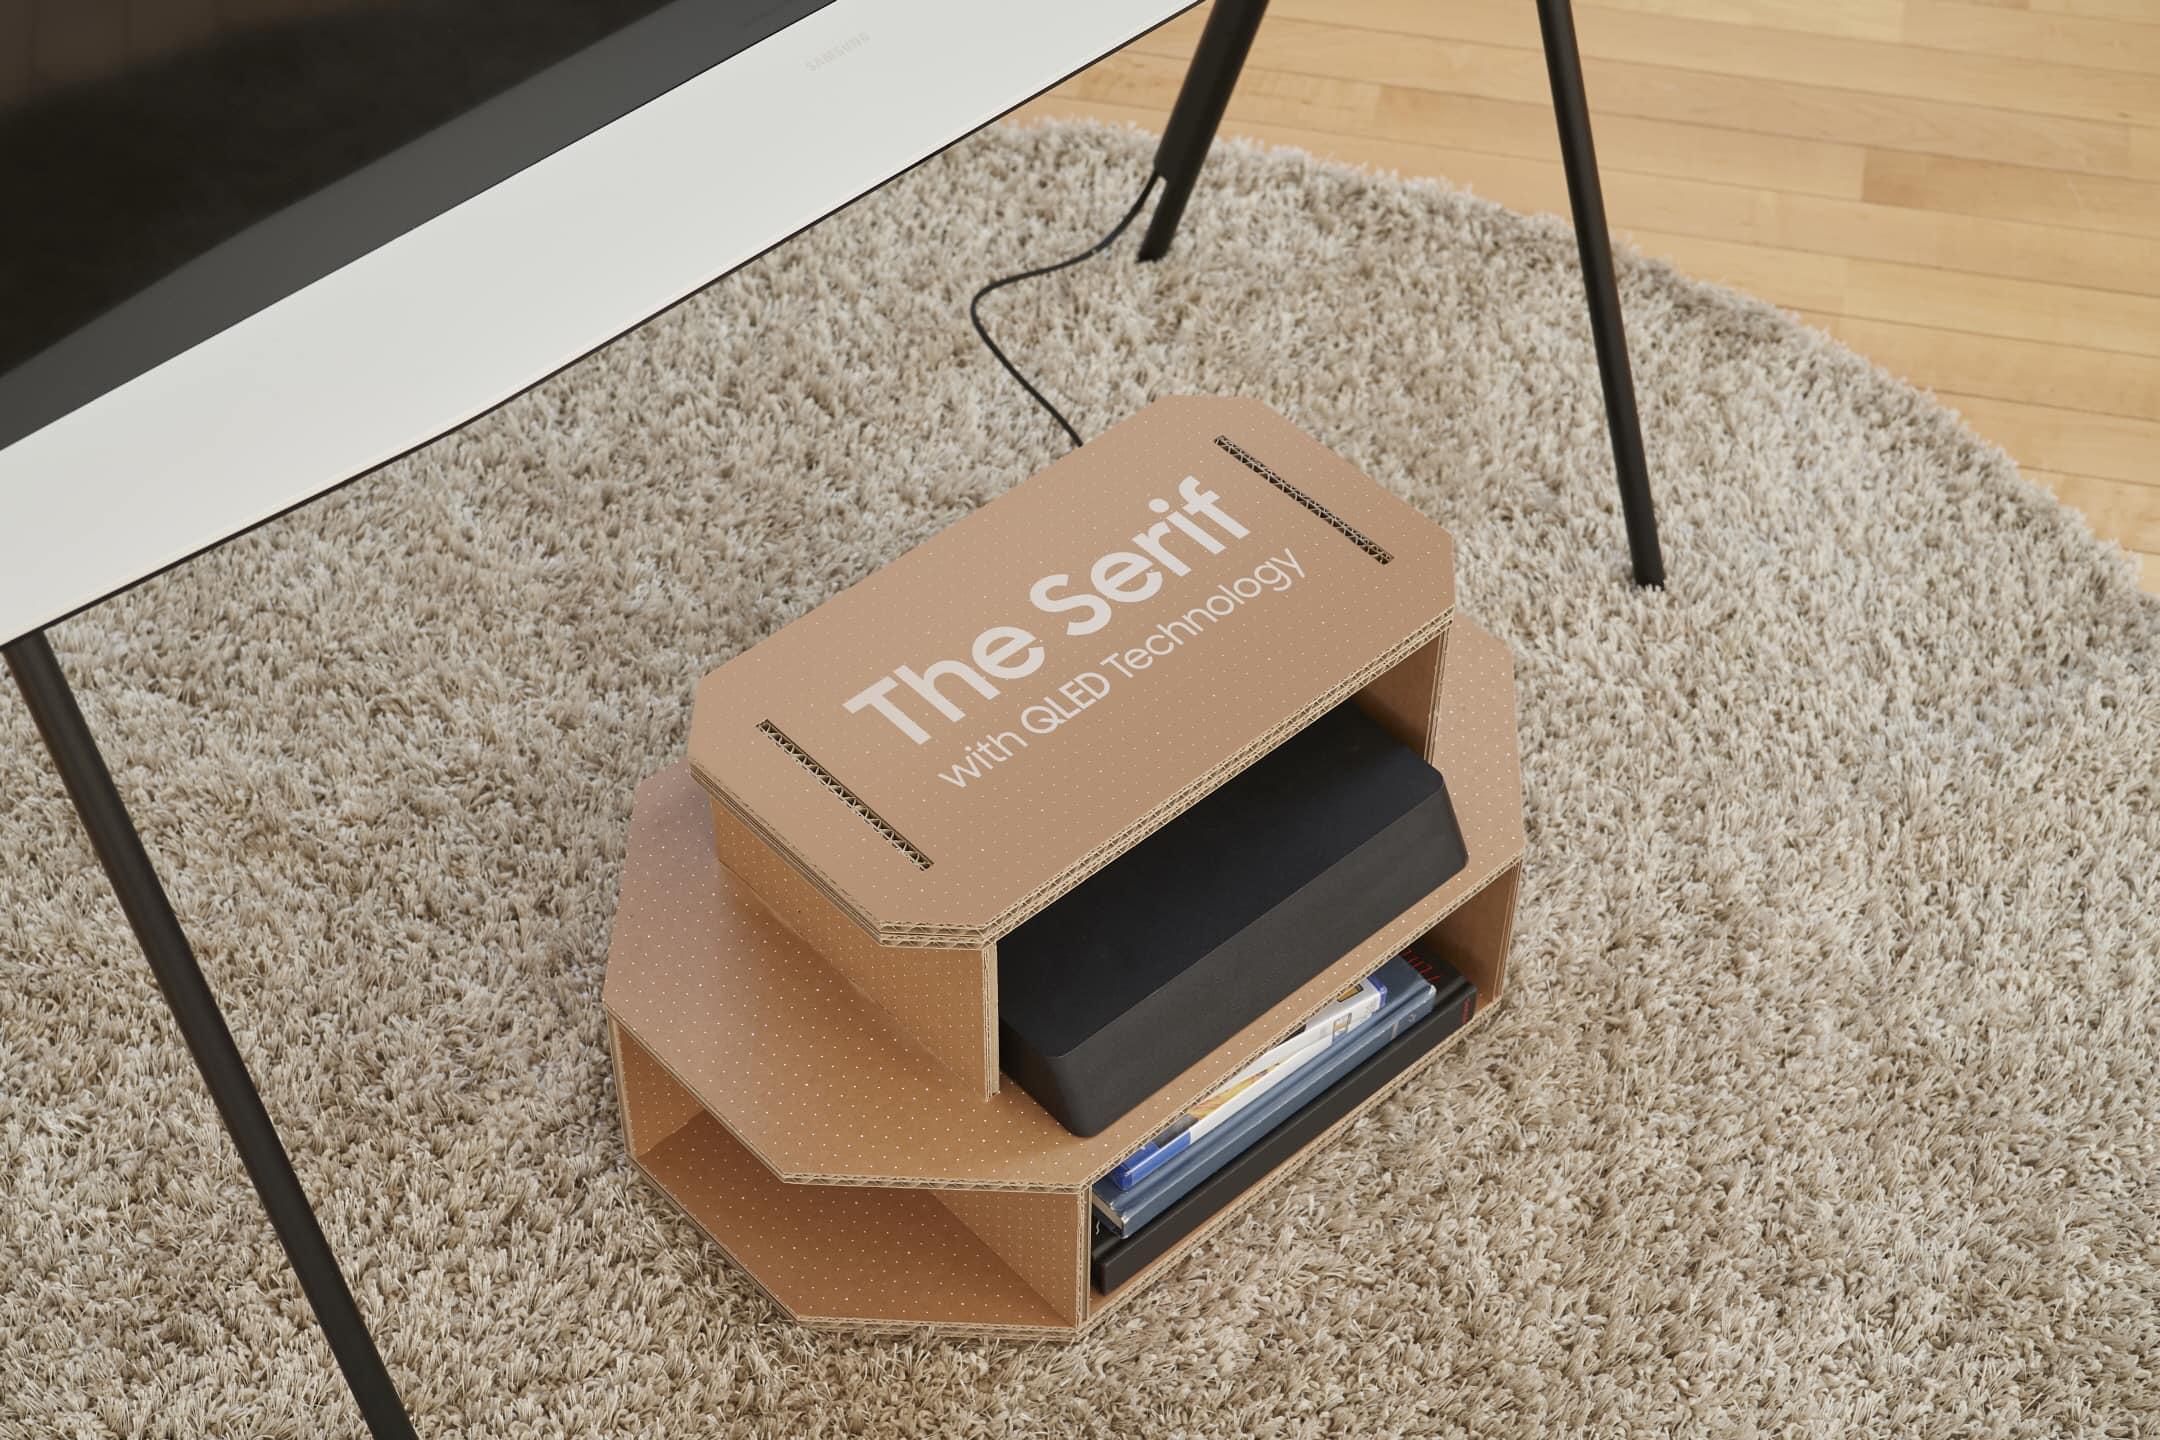 Samsung-TV-box-shelves